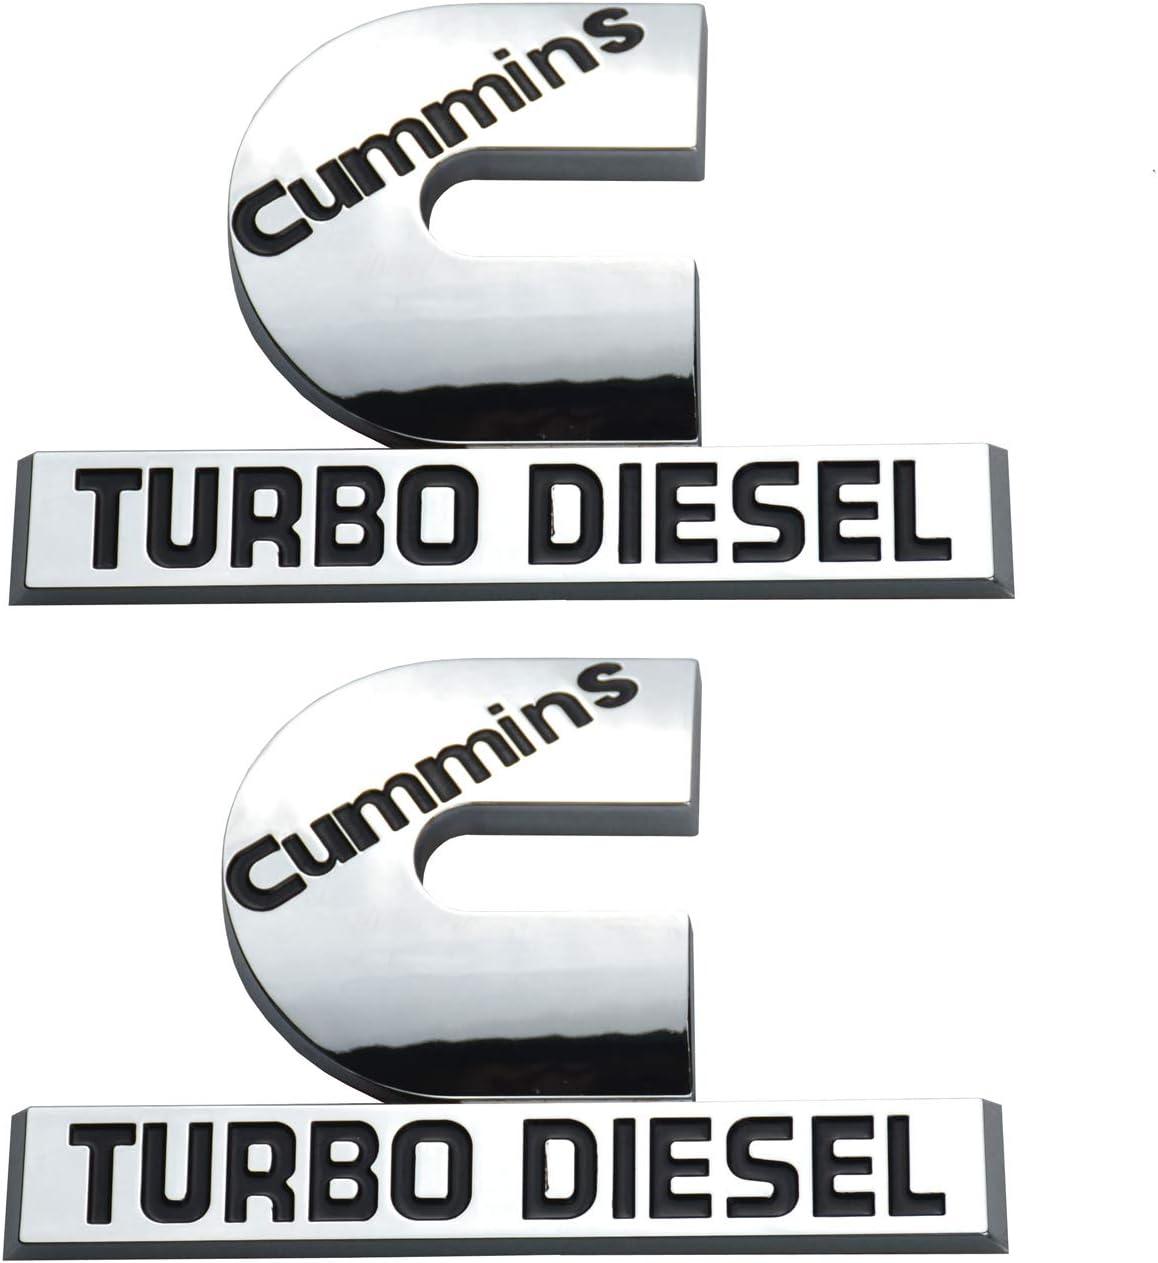 Cummins Turbo Diesel Emblems Chrome Badges High Output Nameplate Replacement Sticker for RAM 2500 3500 Fender Emblem